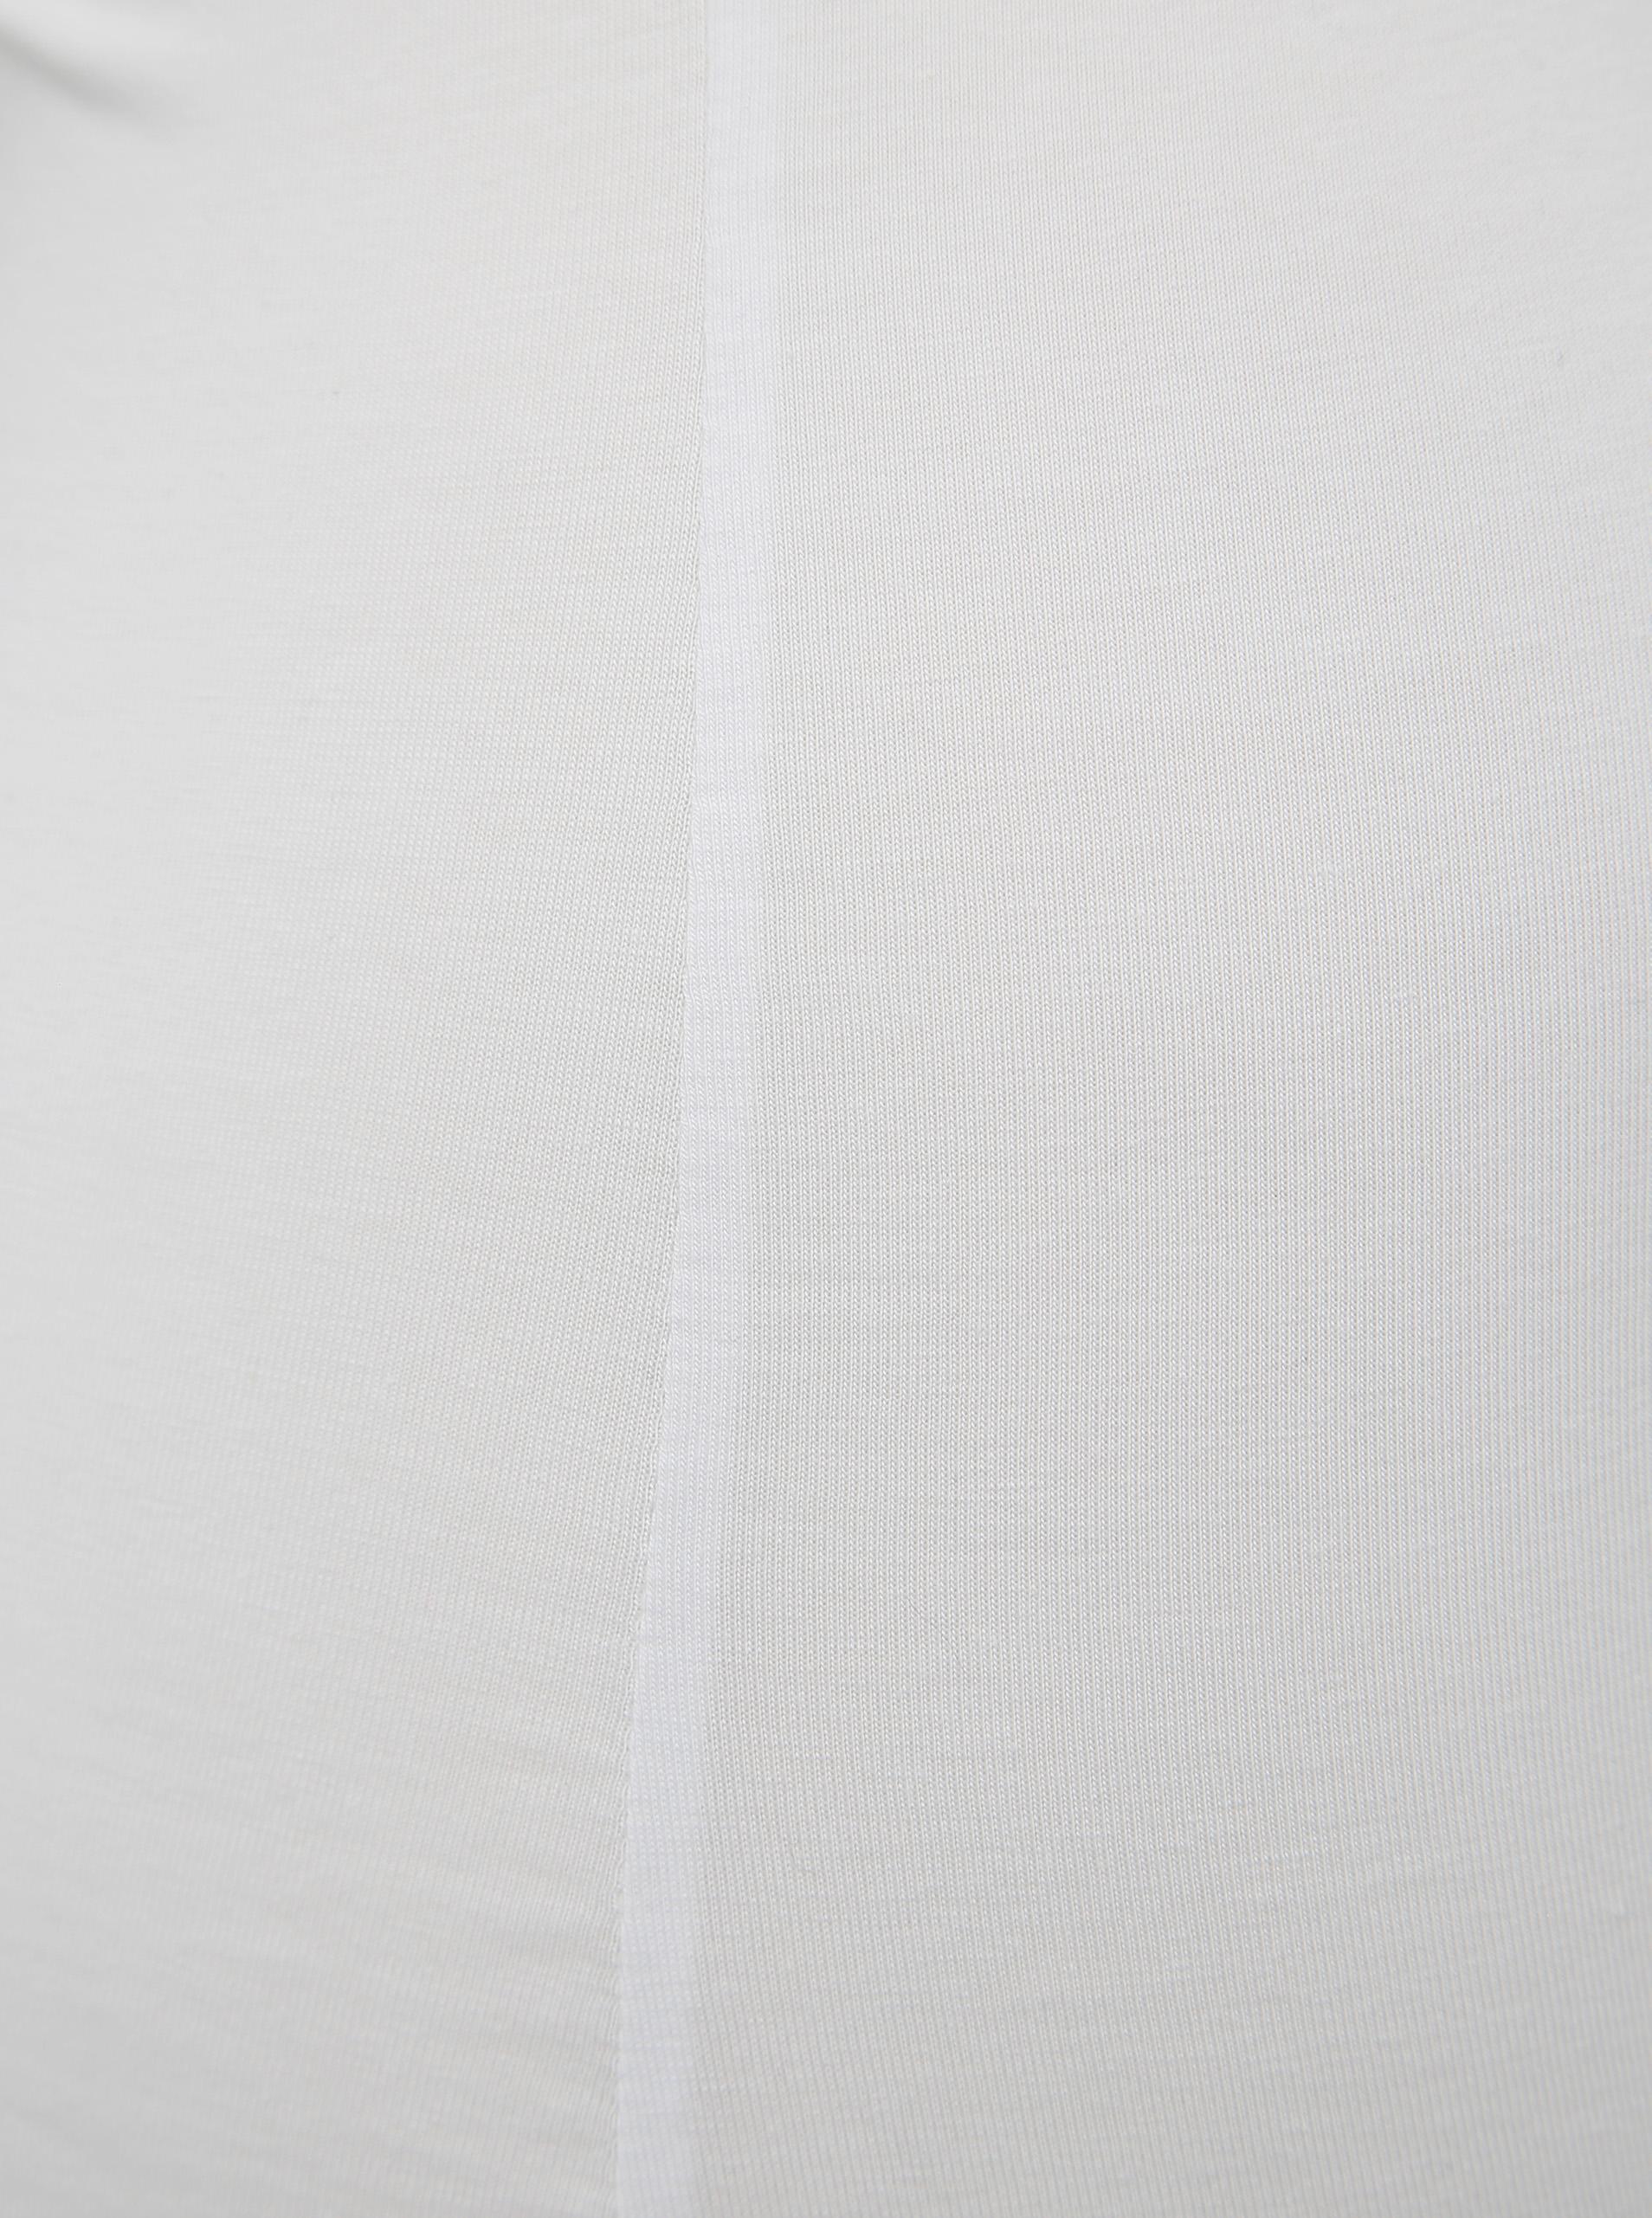 Beli vrh rezervoarja s čipko VERO MODA Inge